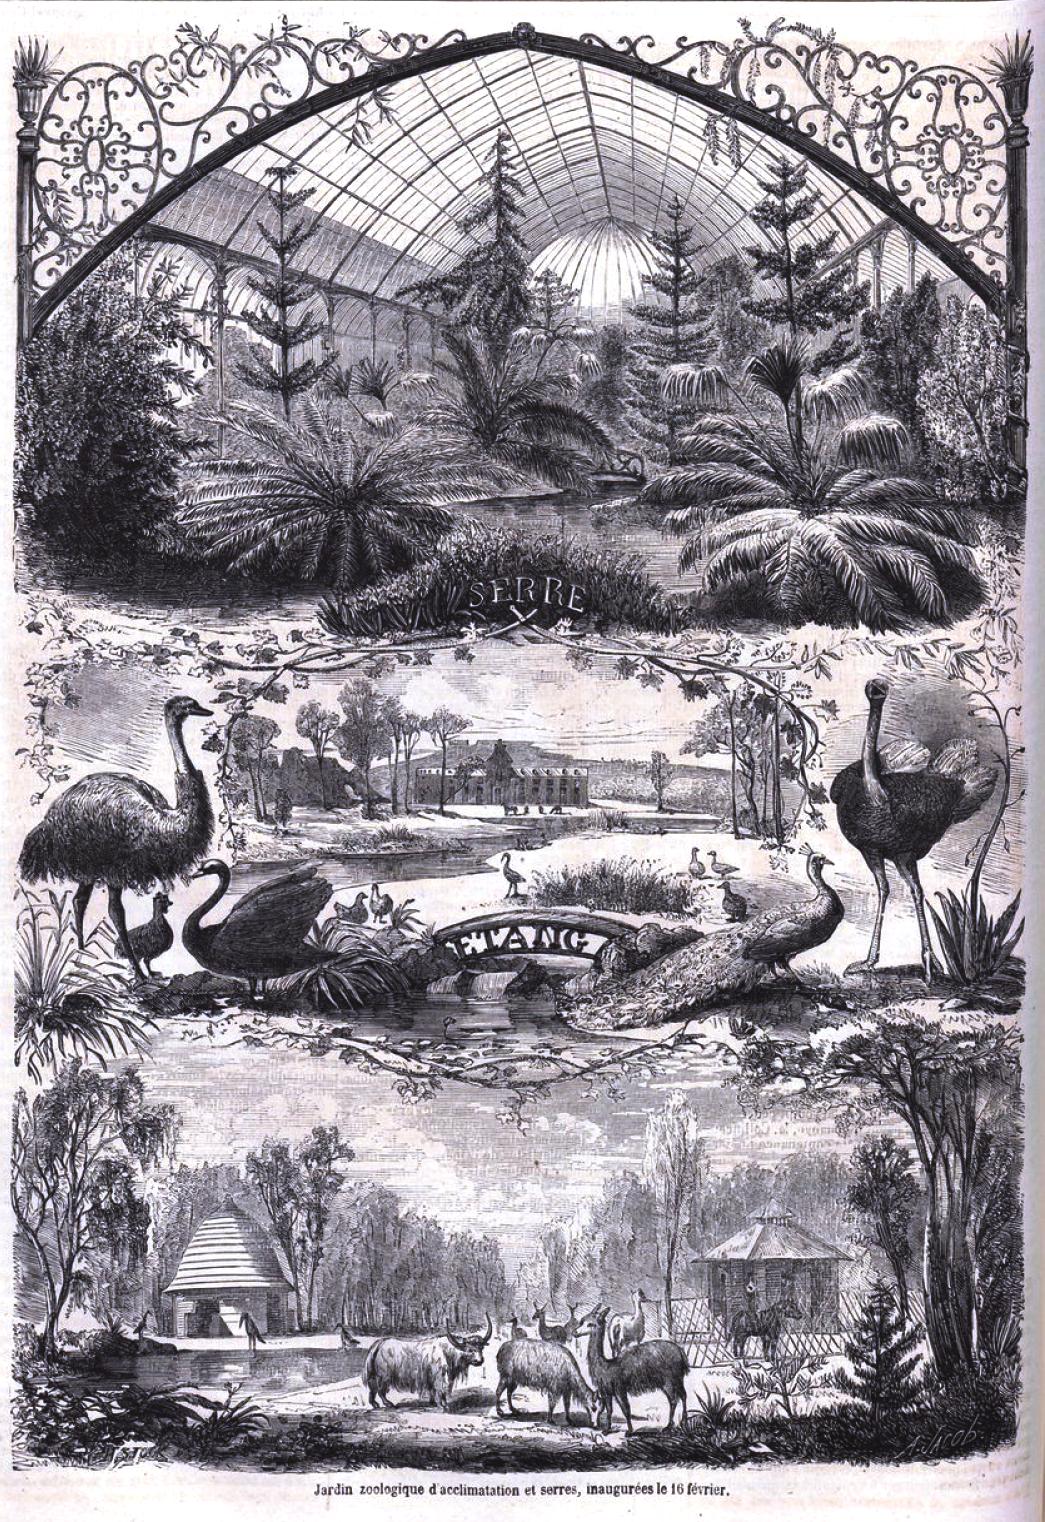 Parco del monviso sito ufficiale for Jardin zoologique d acclimatation